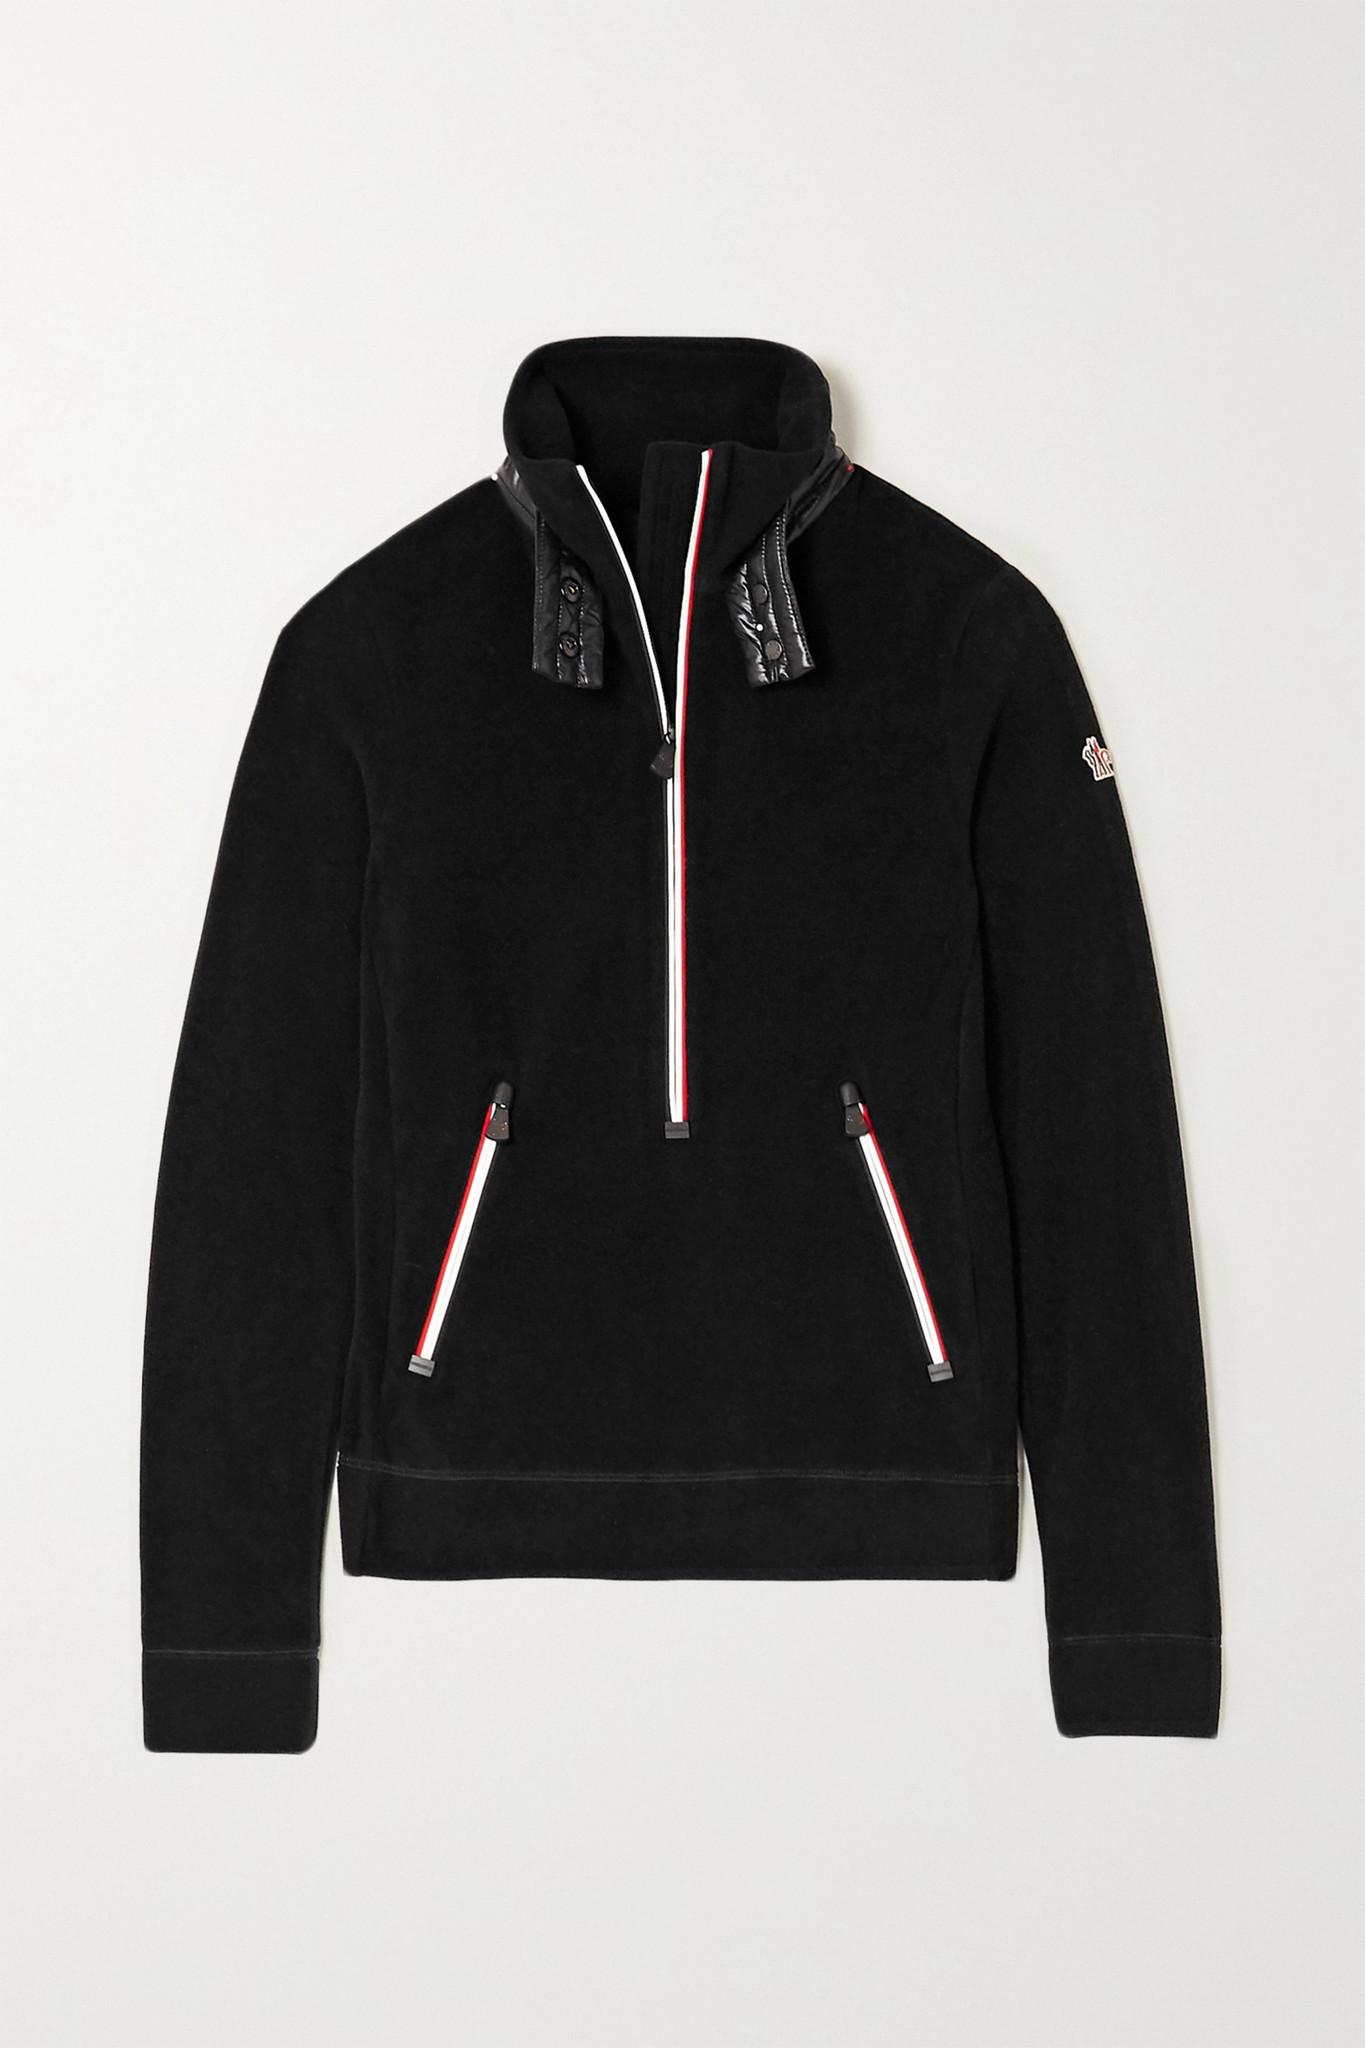 MONCLER GRENOBLE - 软壳面料边饰抓绒上衣 - 黑色 - small